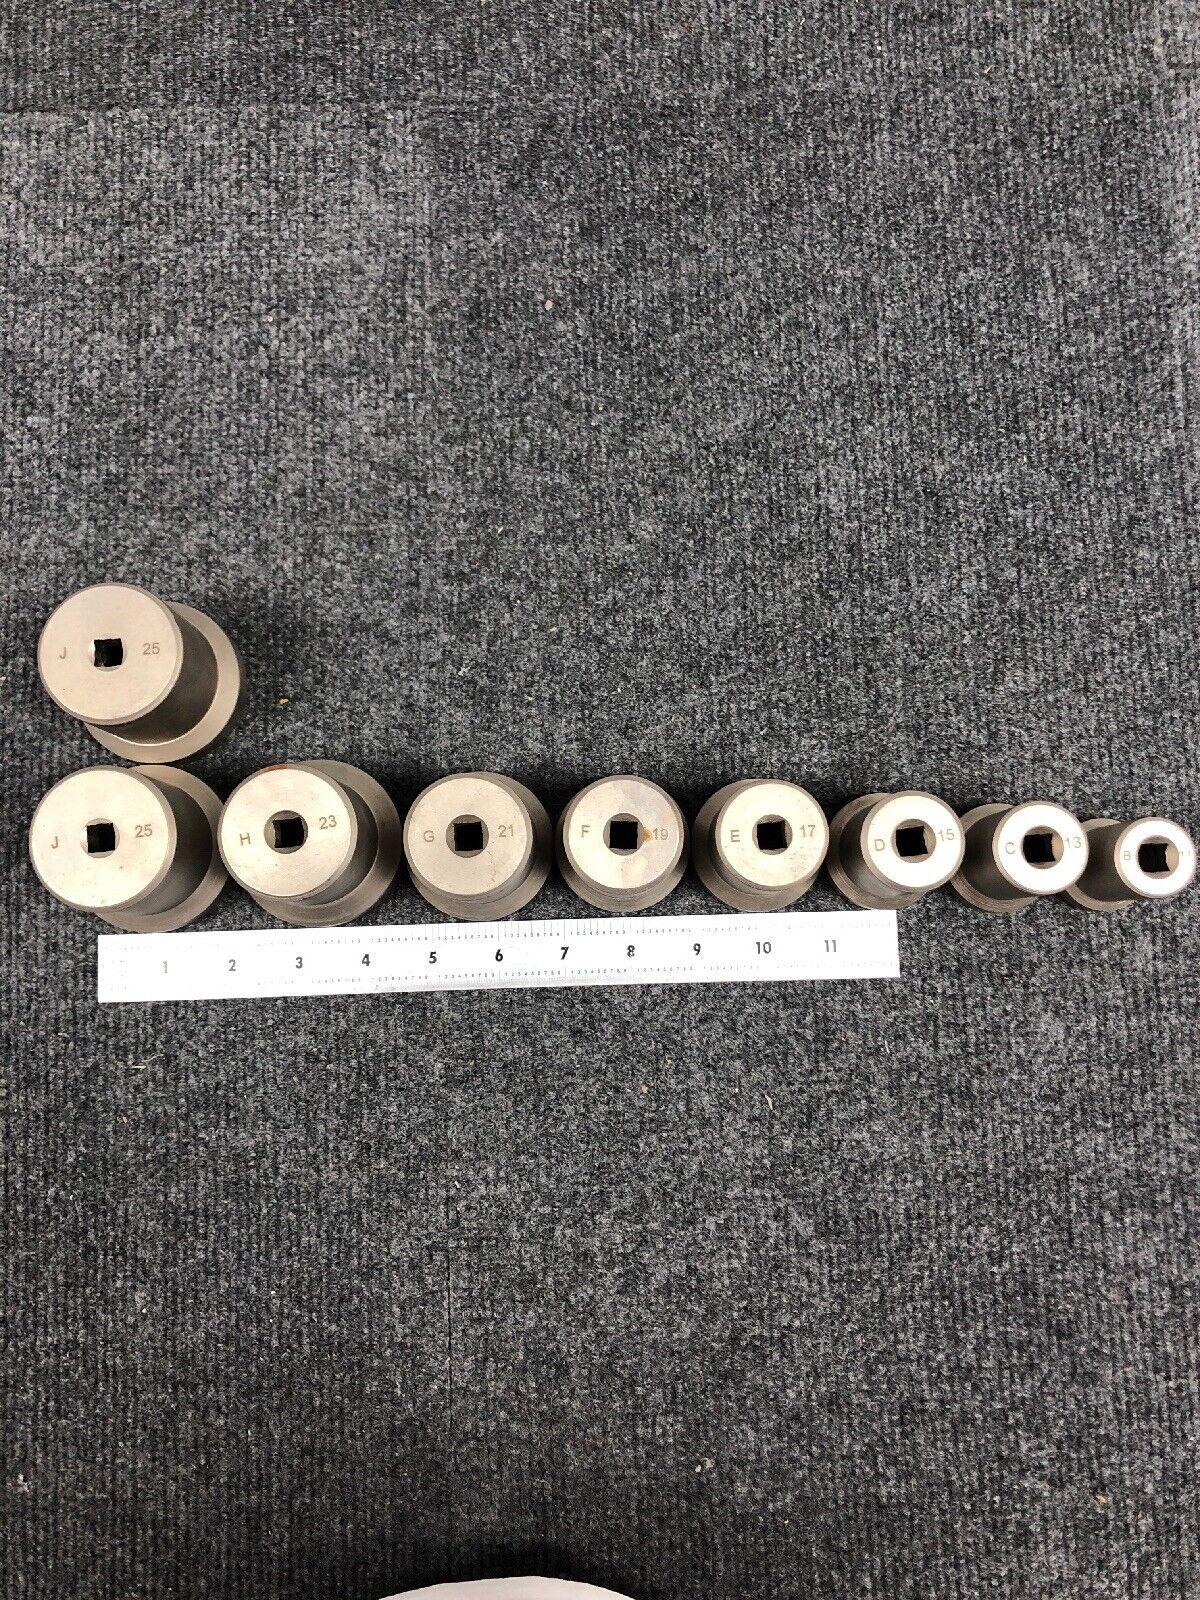 9 Pc LOT STNA Jam Nut Sockets- B11, C13, D15, E17, F19, G21, H23, J25 (2)